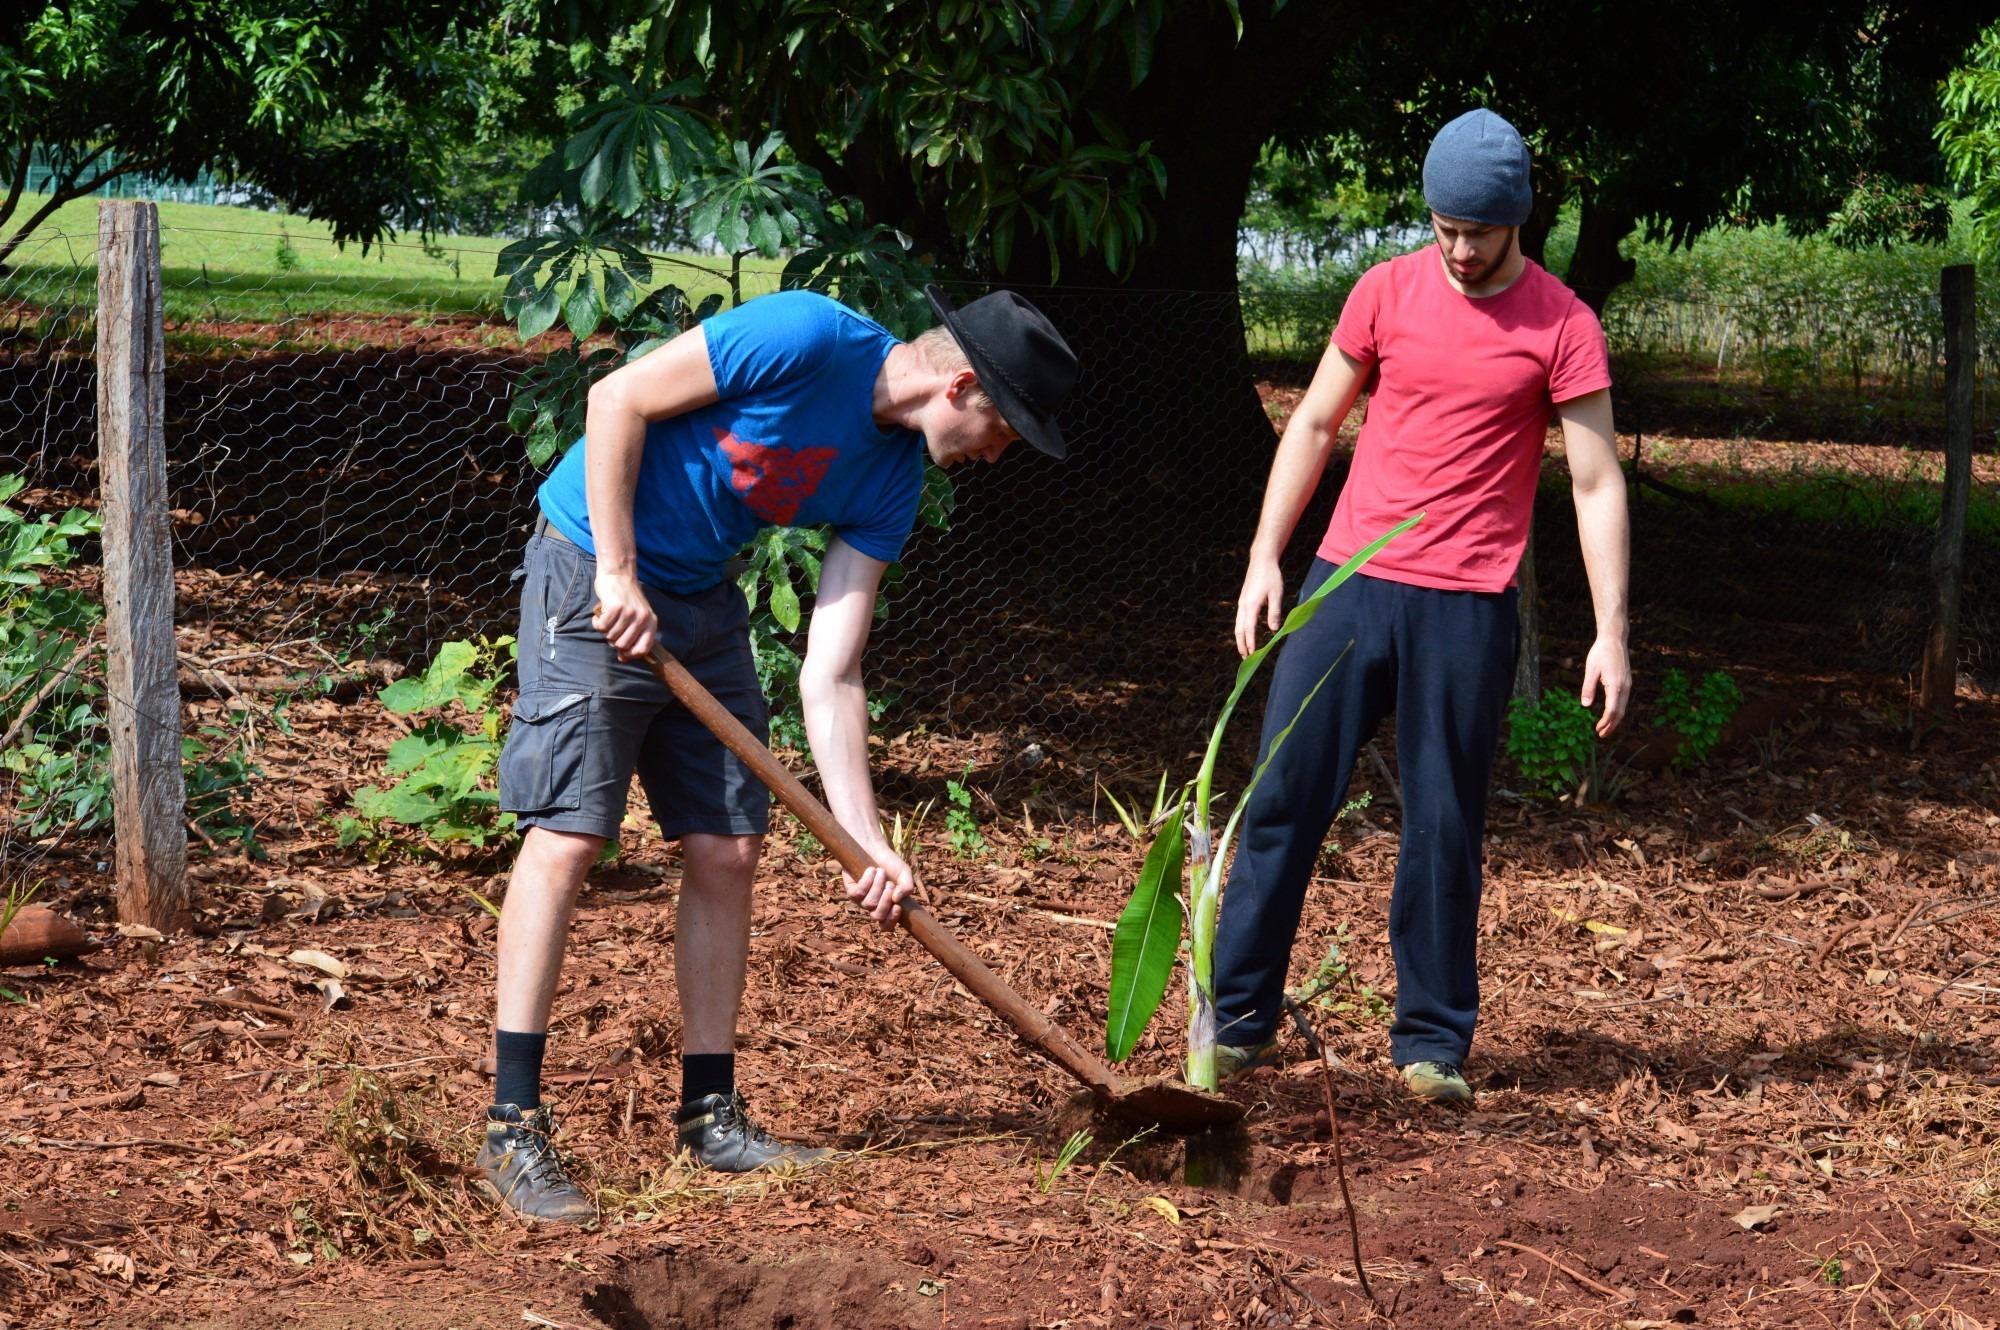 Volunteer stories - What it's like to do volunteer work abroad